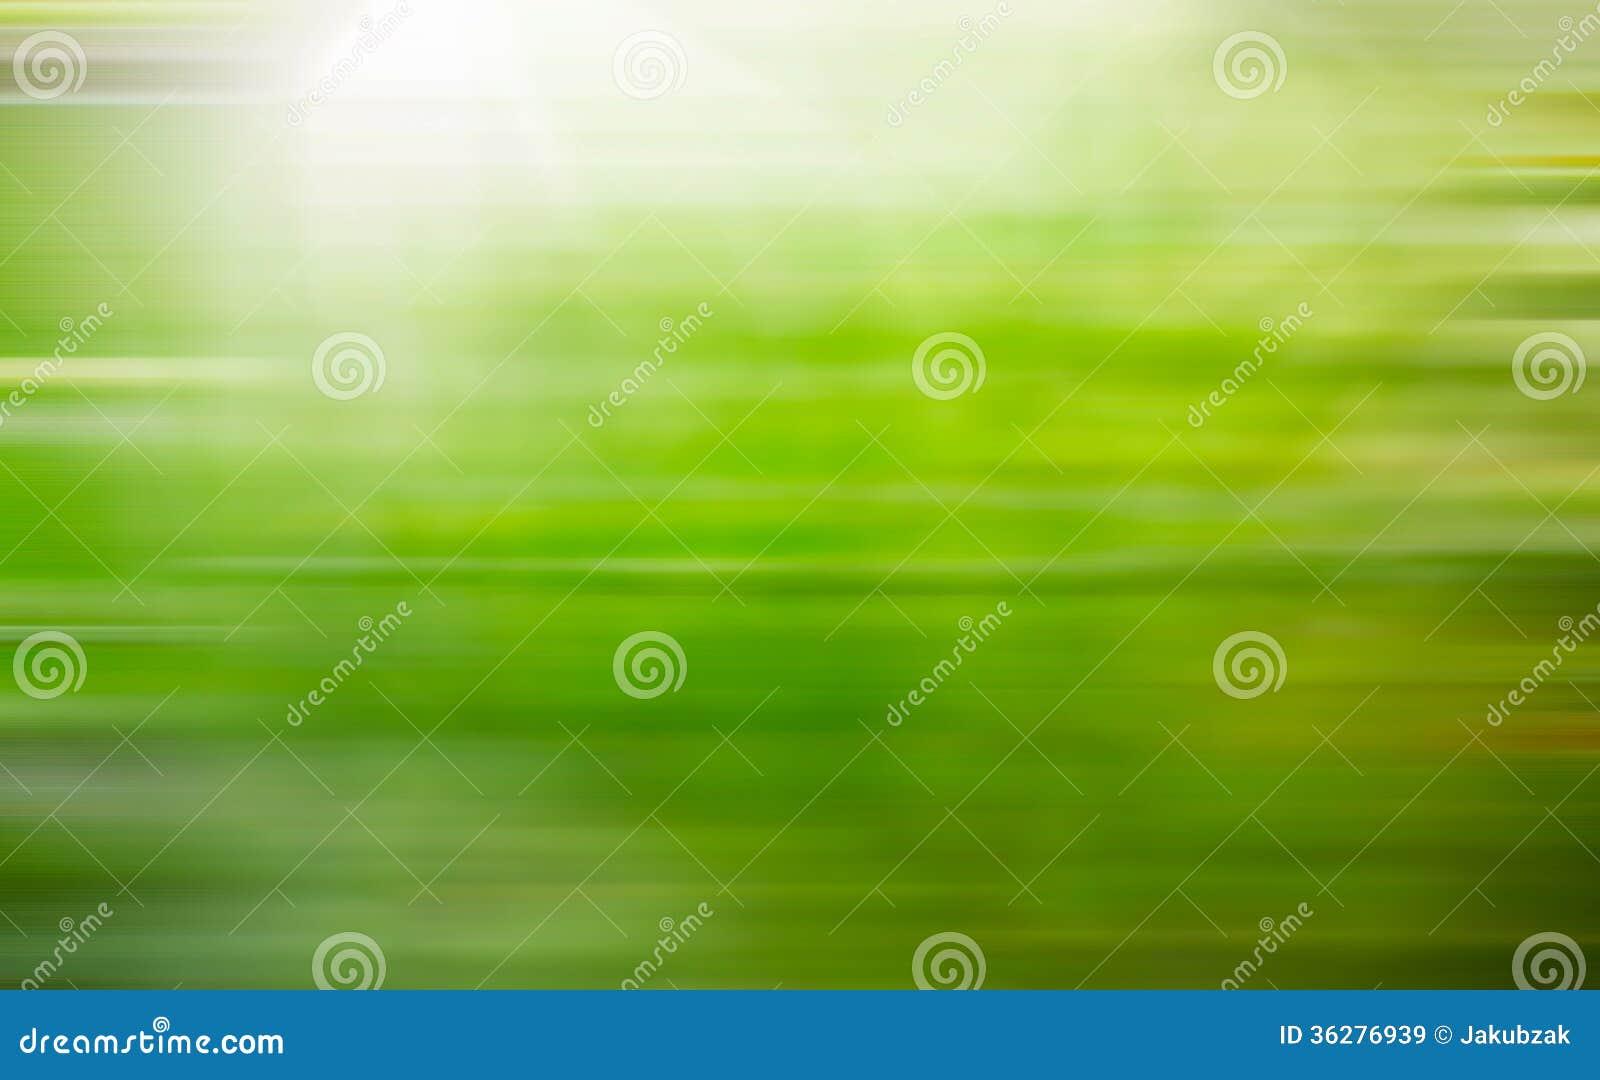 light green background design - photo #29